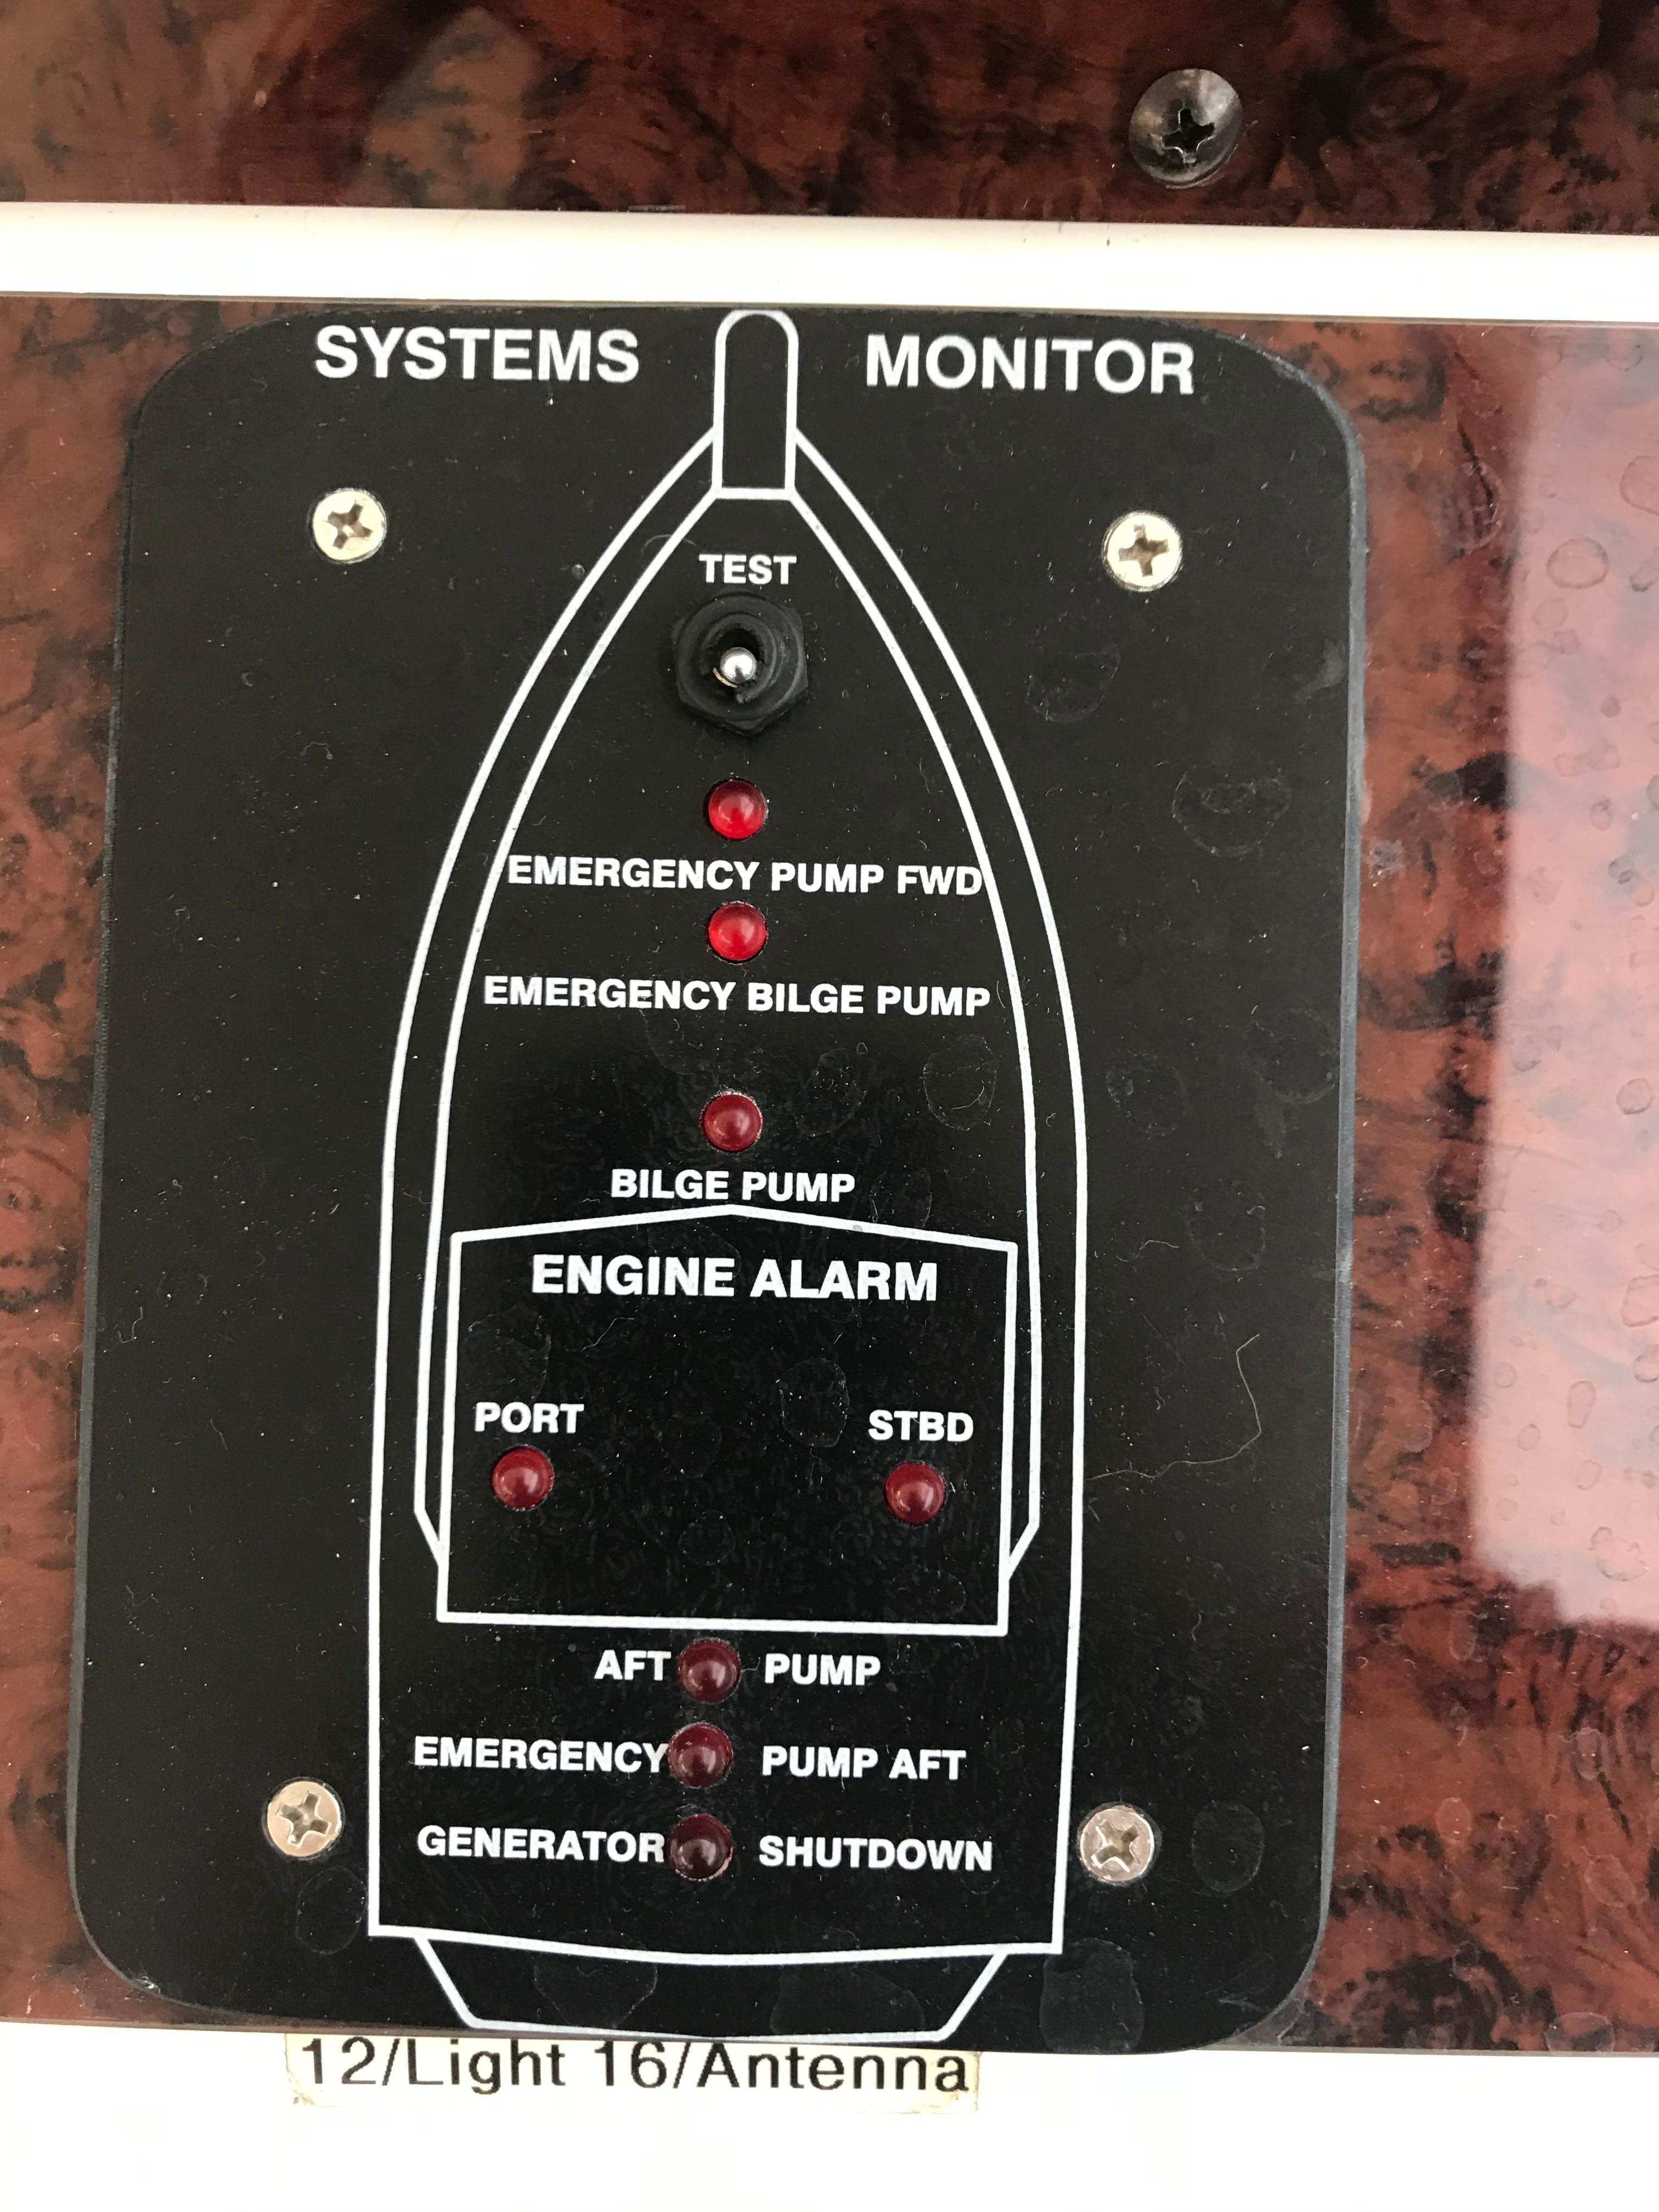 Sea Ray 370 Express Cruiser - Systems monitor